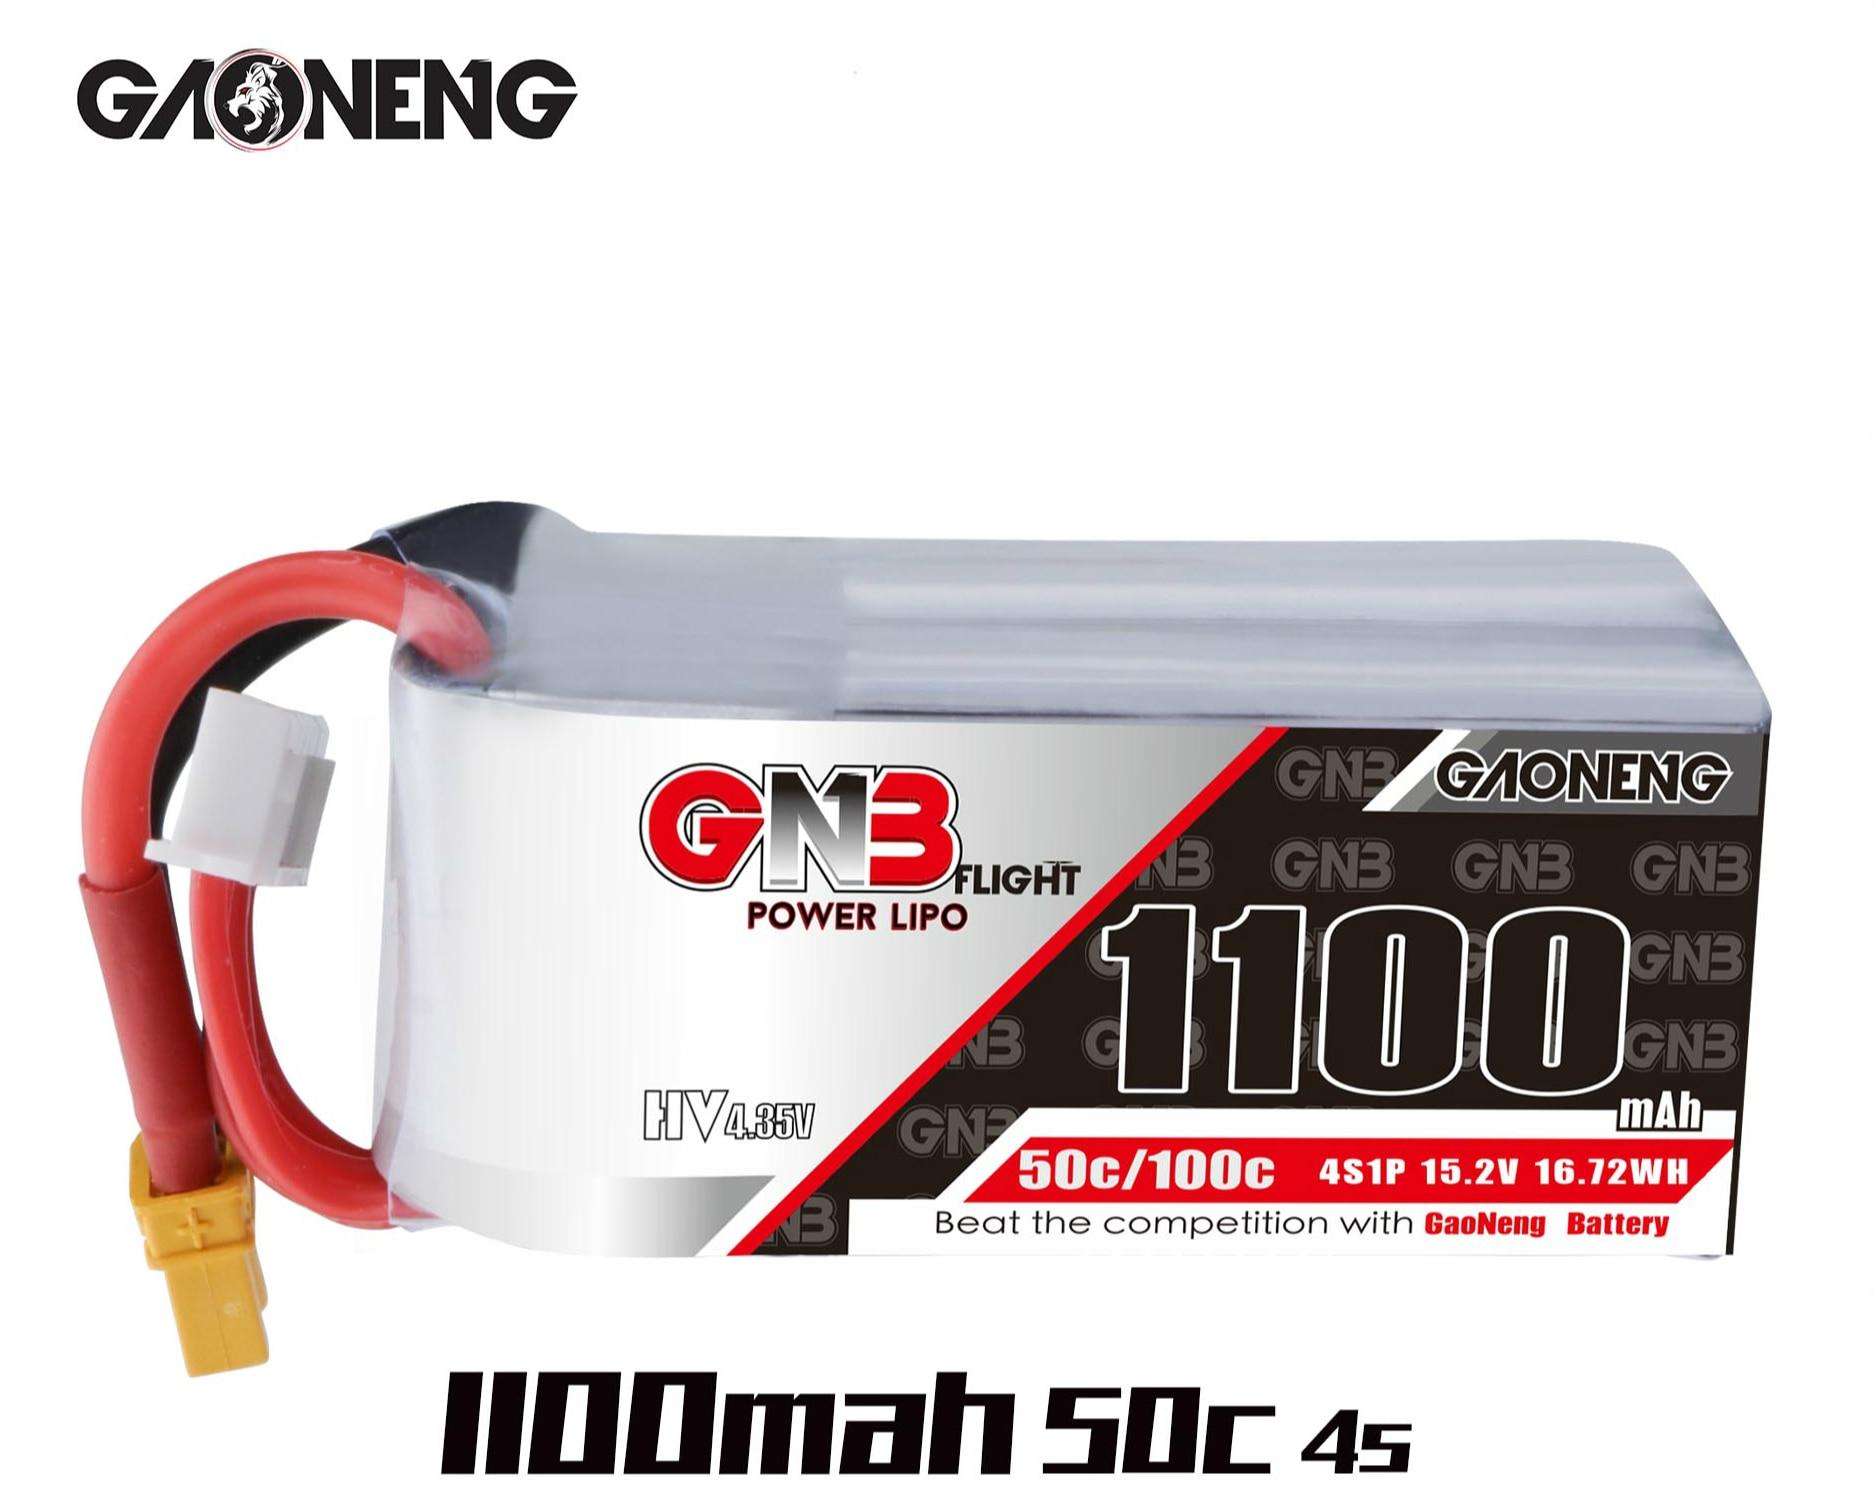 2 pces gaoneng gnb 1100 mah 4S/5S/6 s 50c 19 v hv lipo bateria xt30/xt60 para rc zangão fpv corrida freestyle iflight nazgul5 4S 6 s